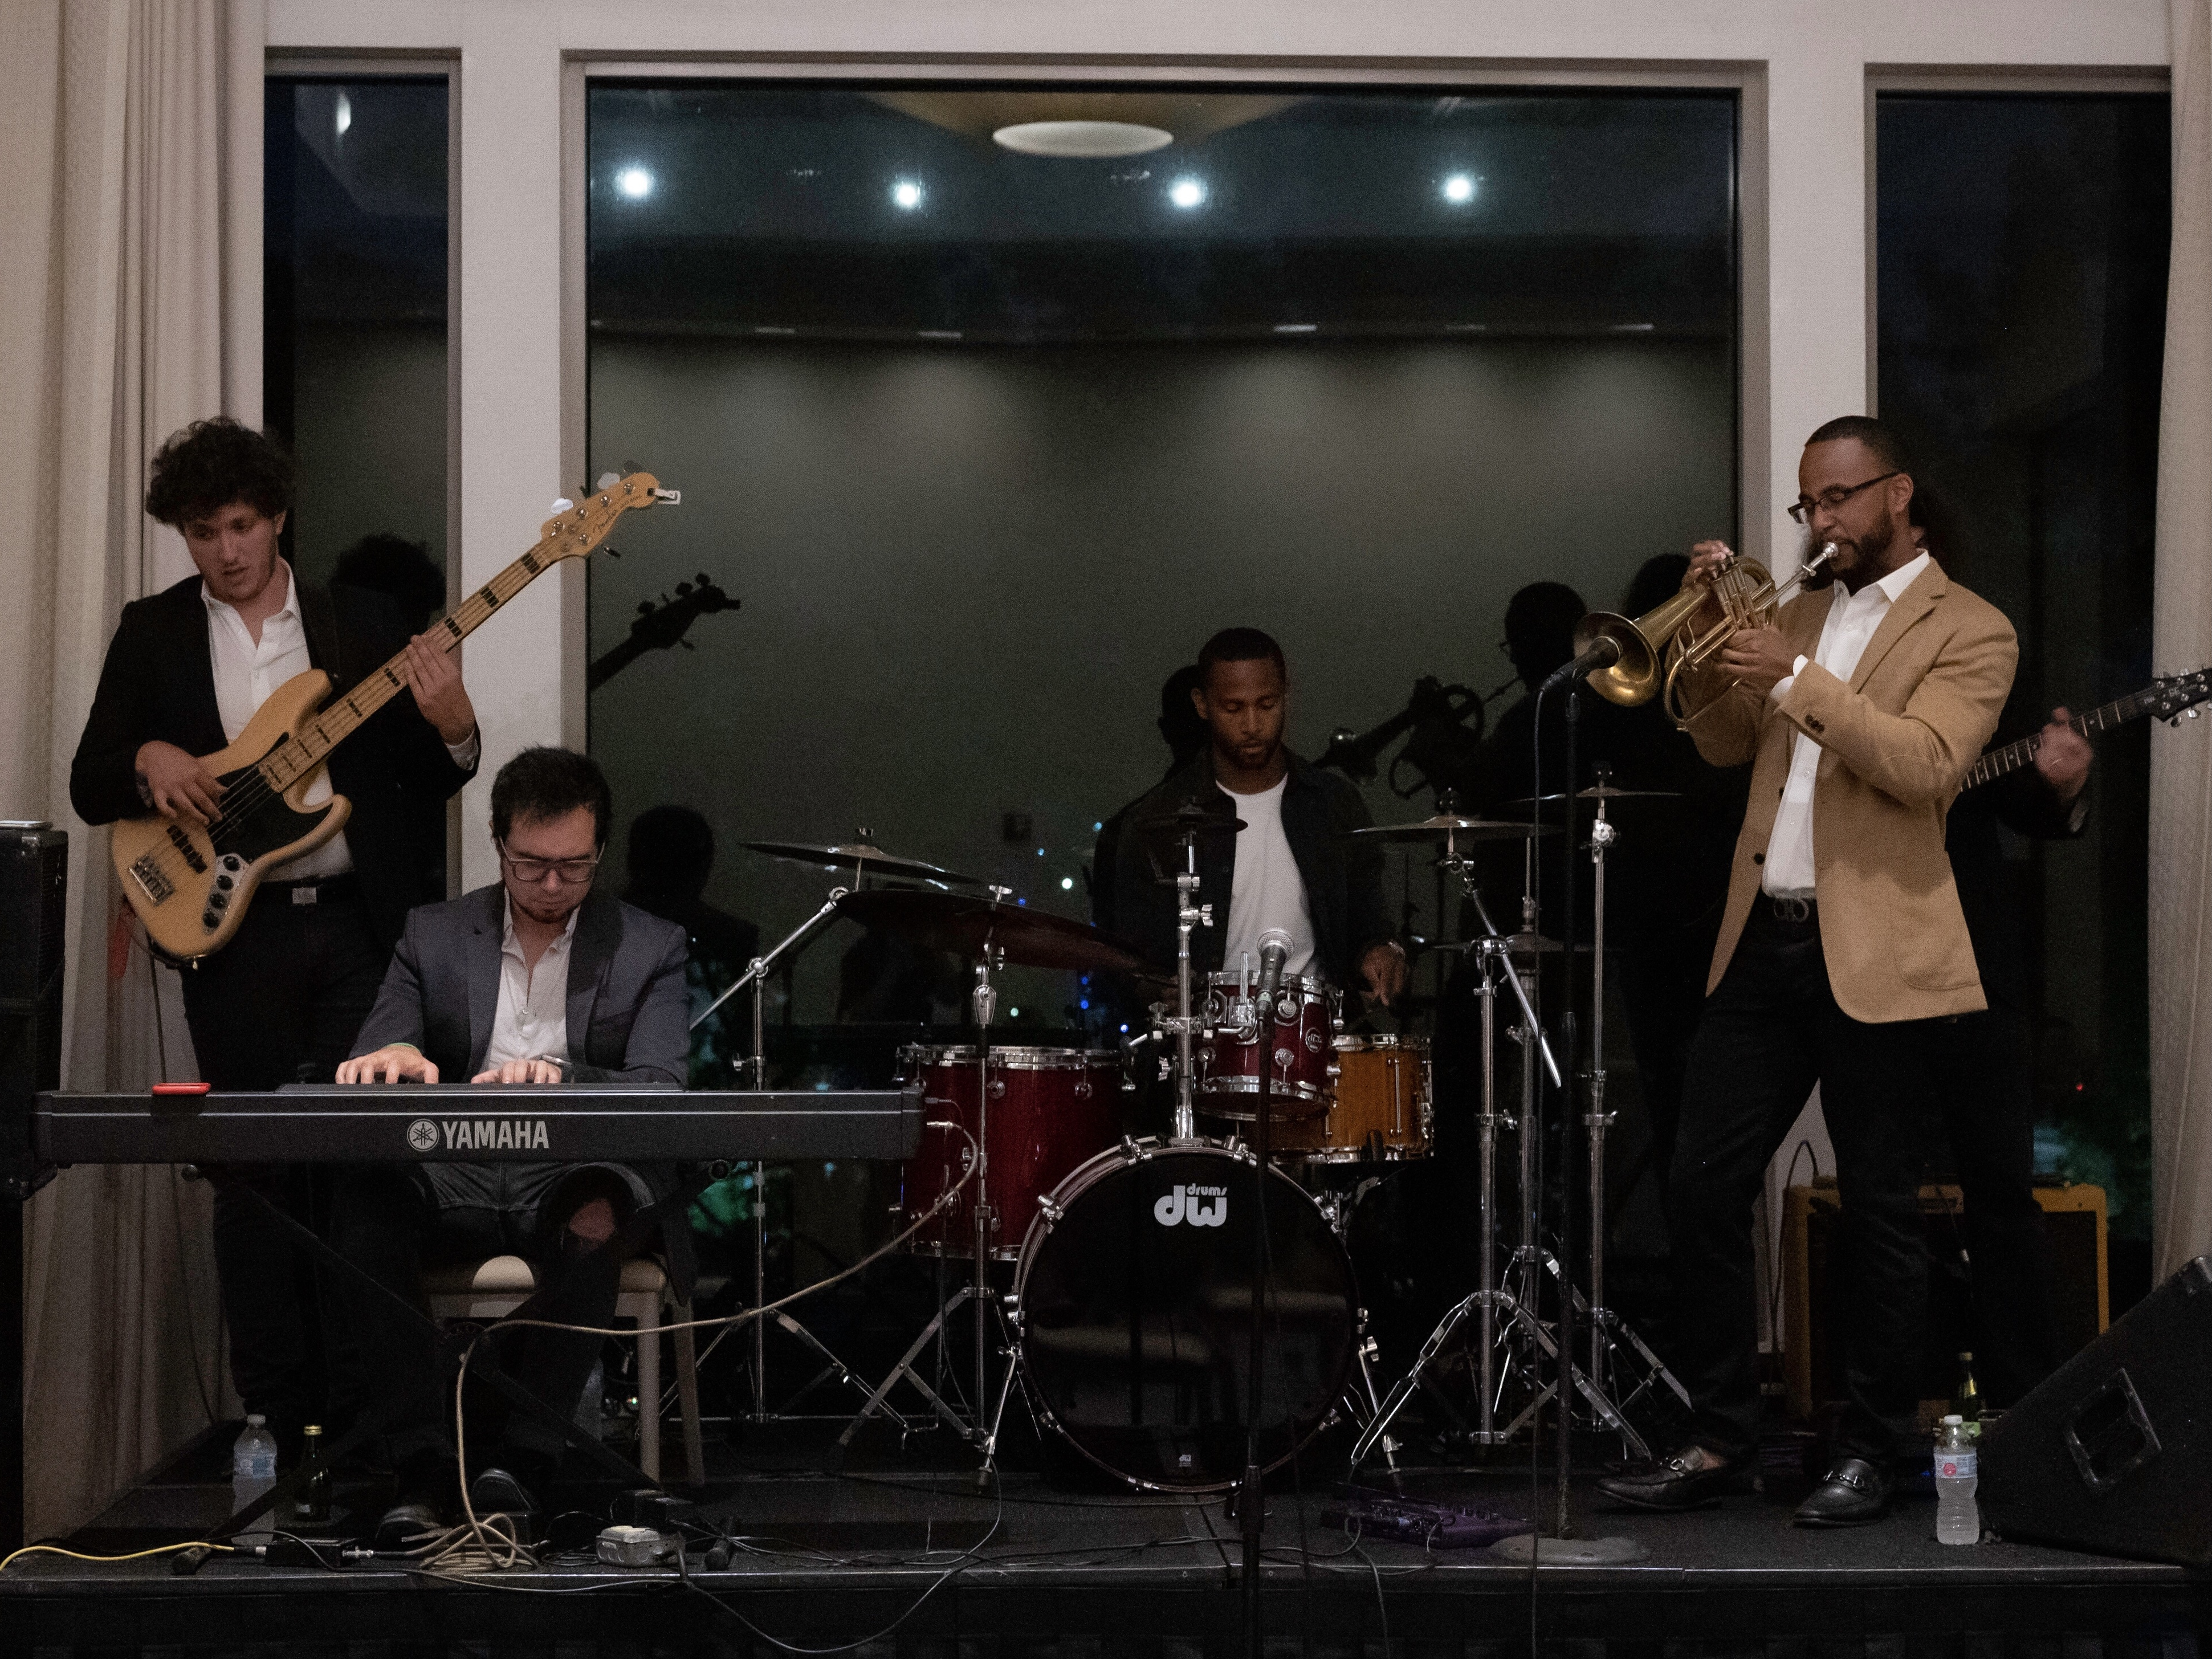 House of Bethel performs in Philadelphia. From left: Tim Khayat (bass), Jonathan Lovett (keyboard), Justin Bethel (drums), Gabriel Bethel (trumpet), Jonathan Knott (hidden, on guitar).